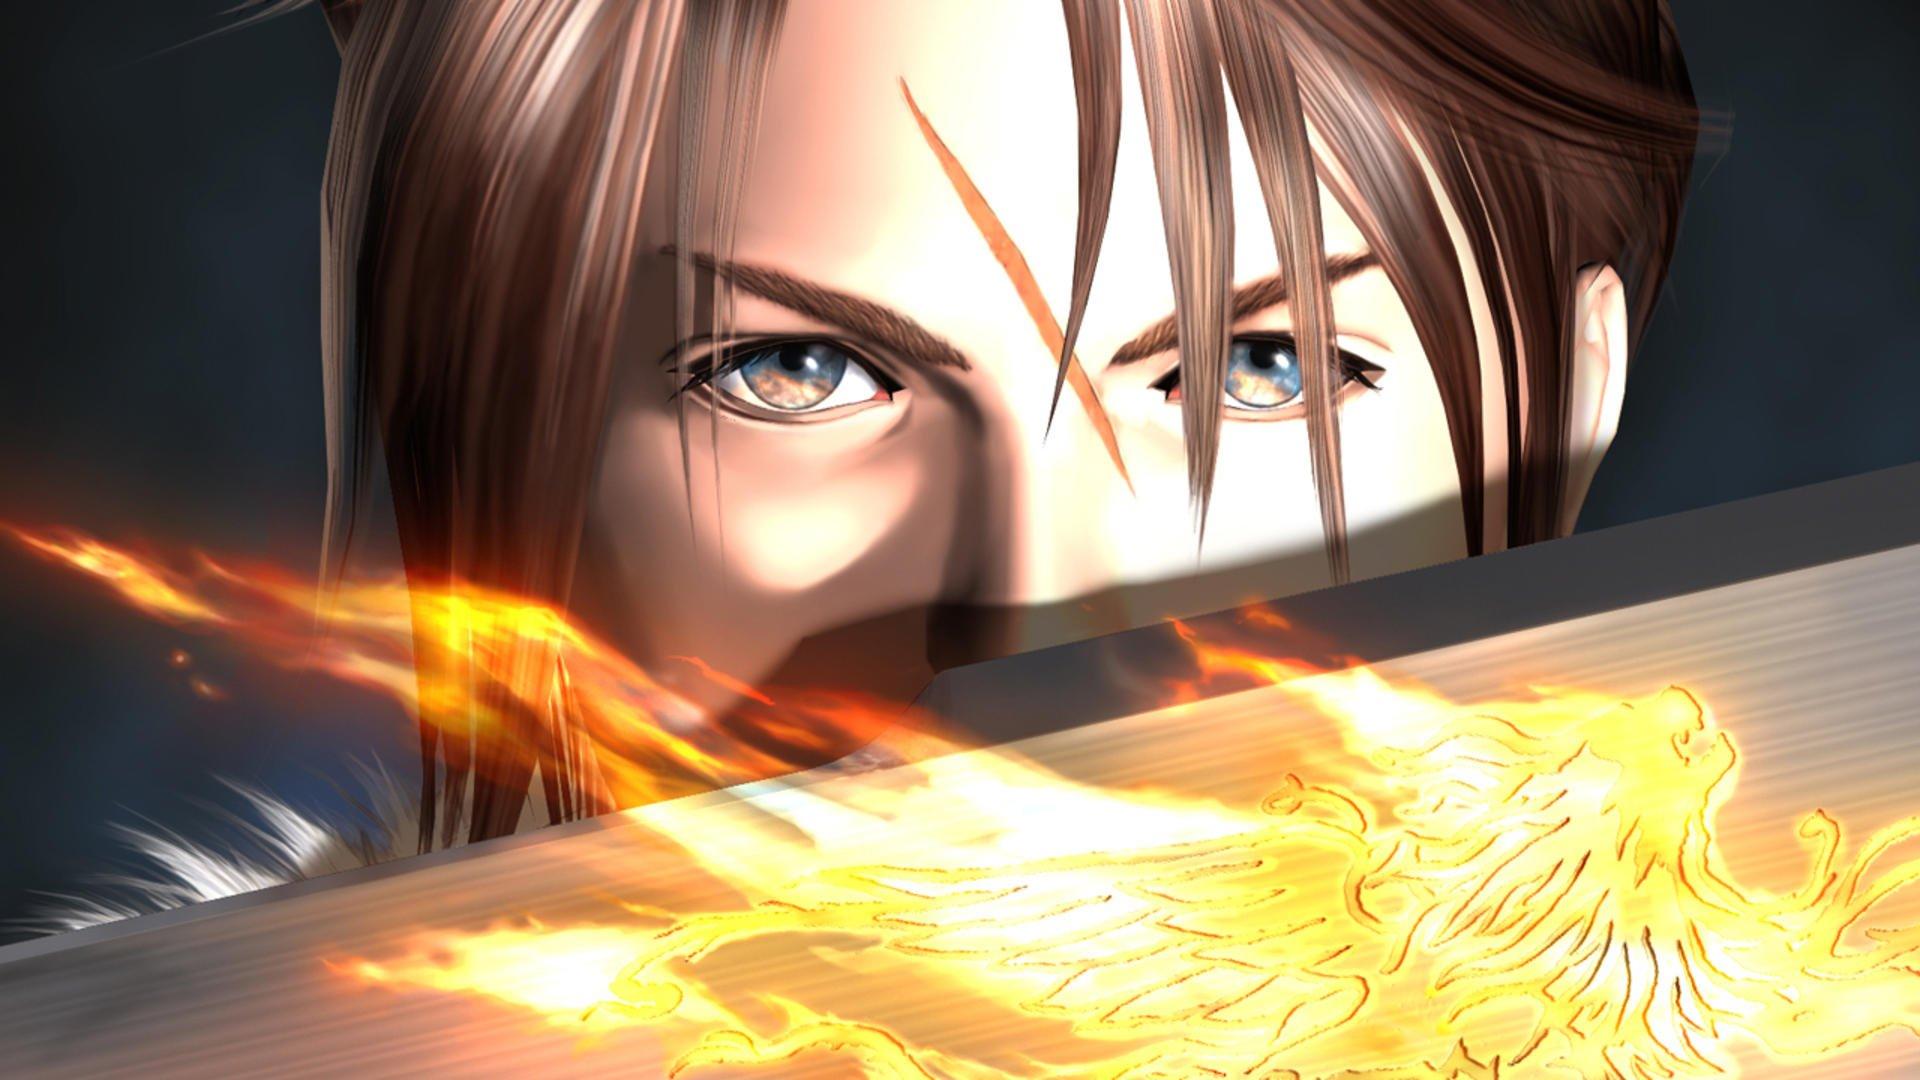 Date de sortie de Final Fantasy VIII Remastered annoncée